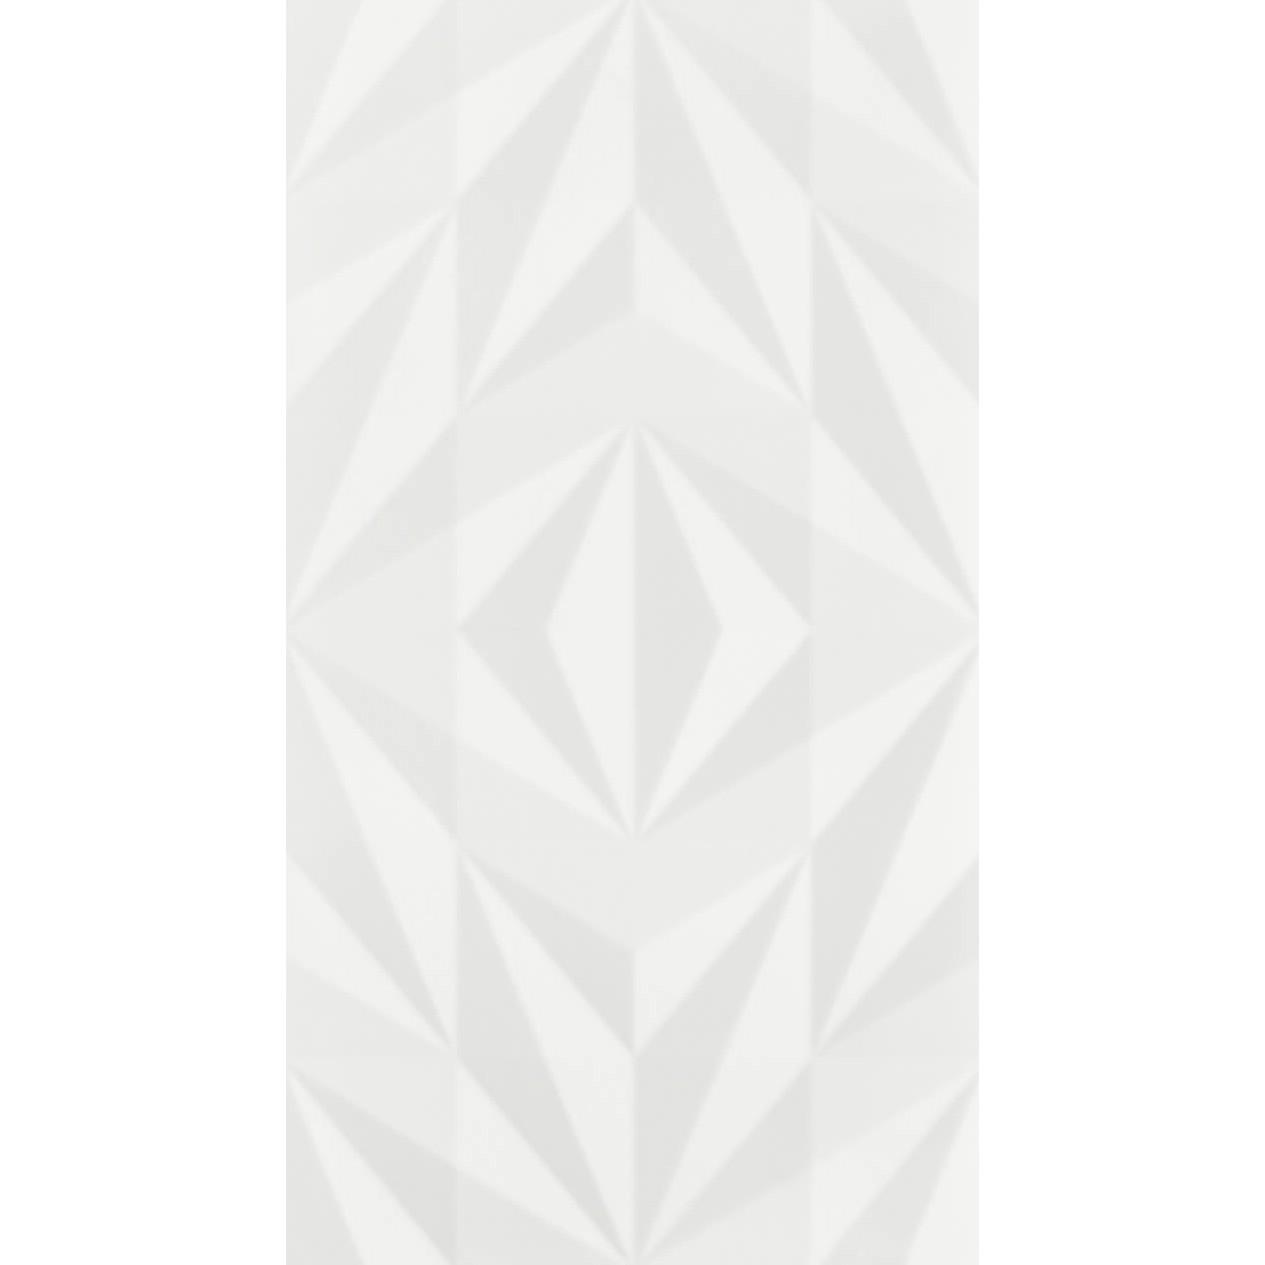 Revestimento 325x59 cm Brilhante Losango Branco - 8040177 - Eliane